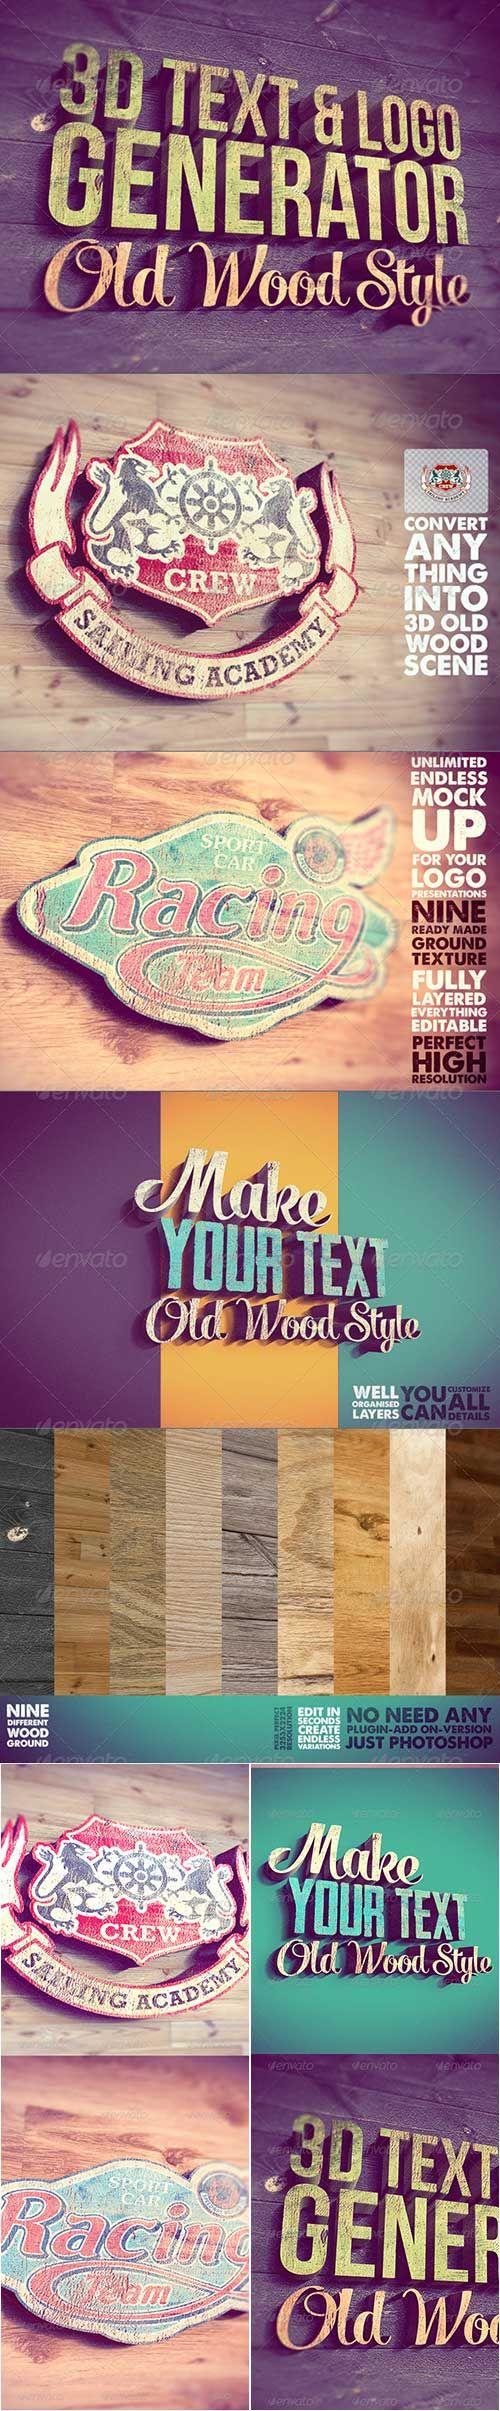 3D Text Logo Generator 2 » Free Hero Graphic Design